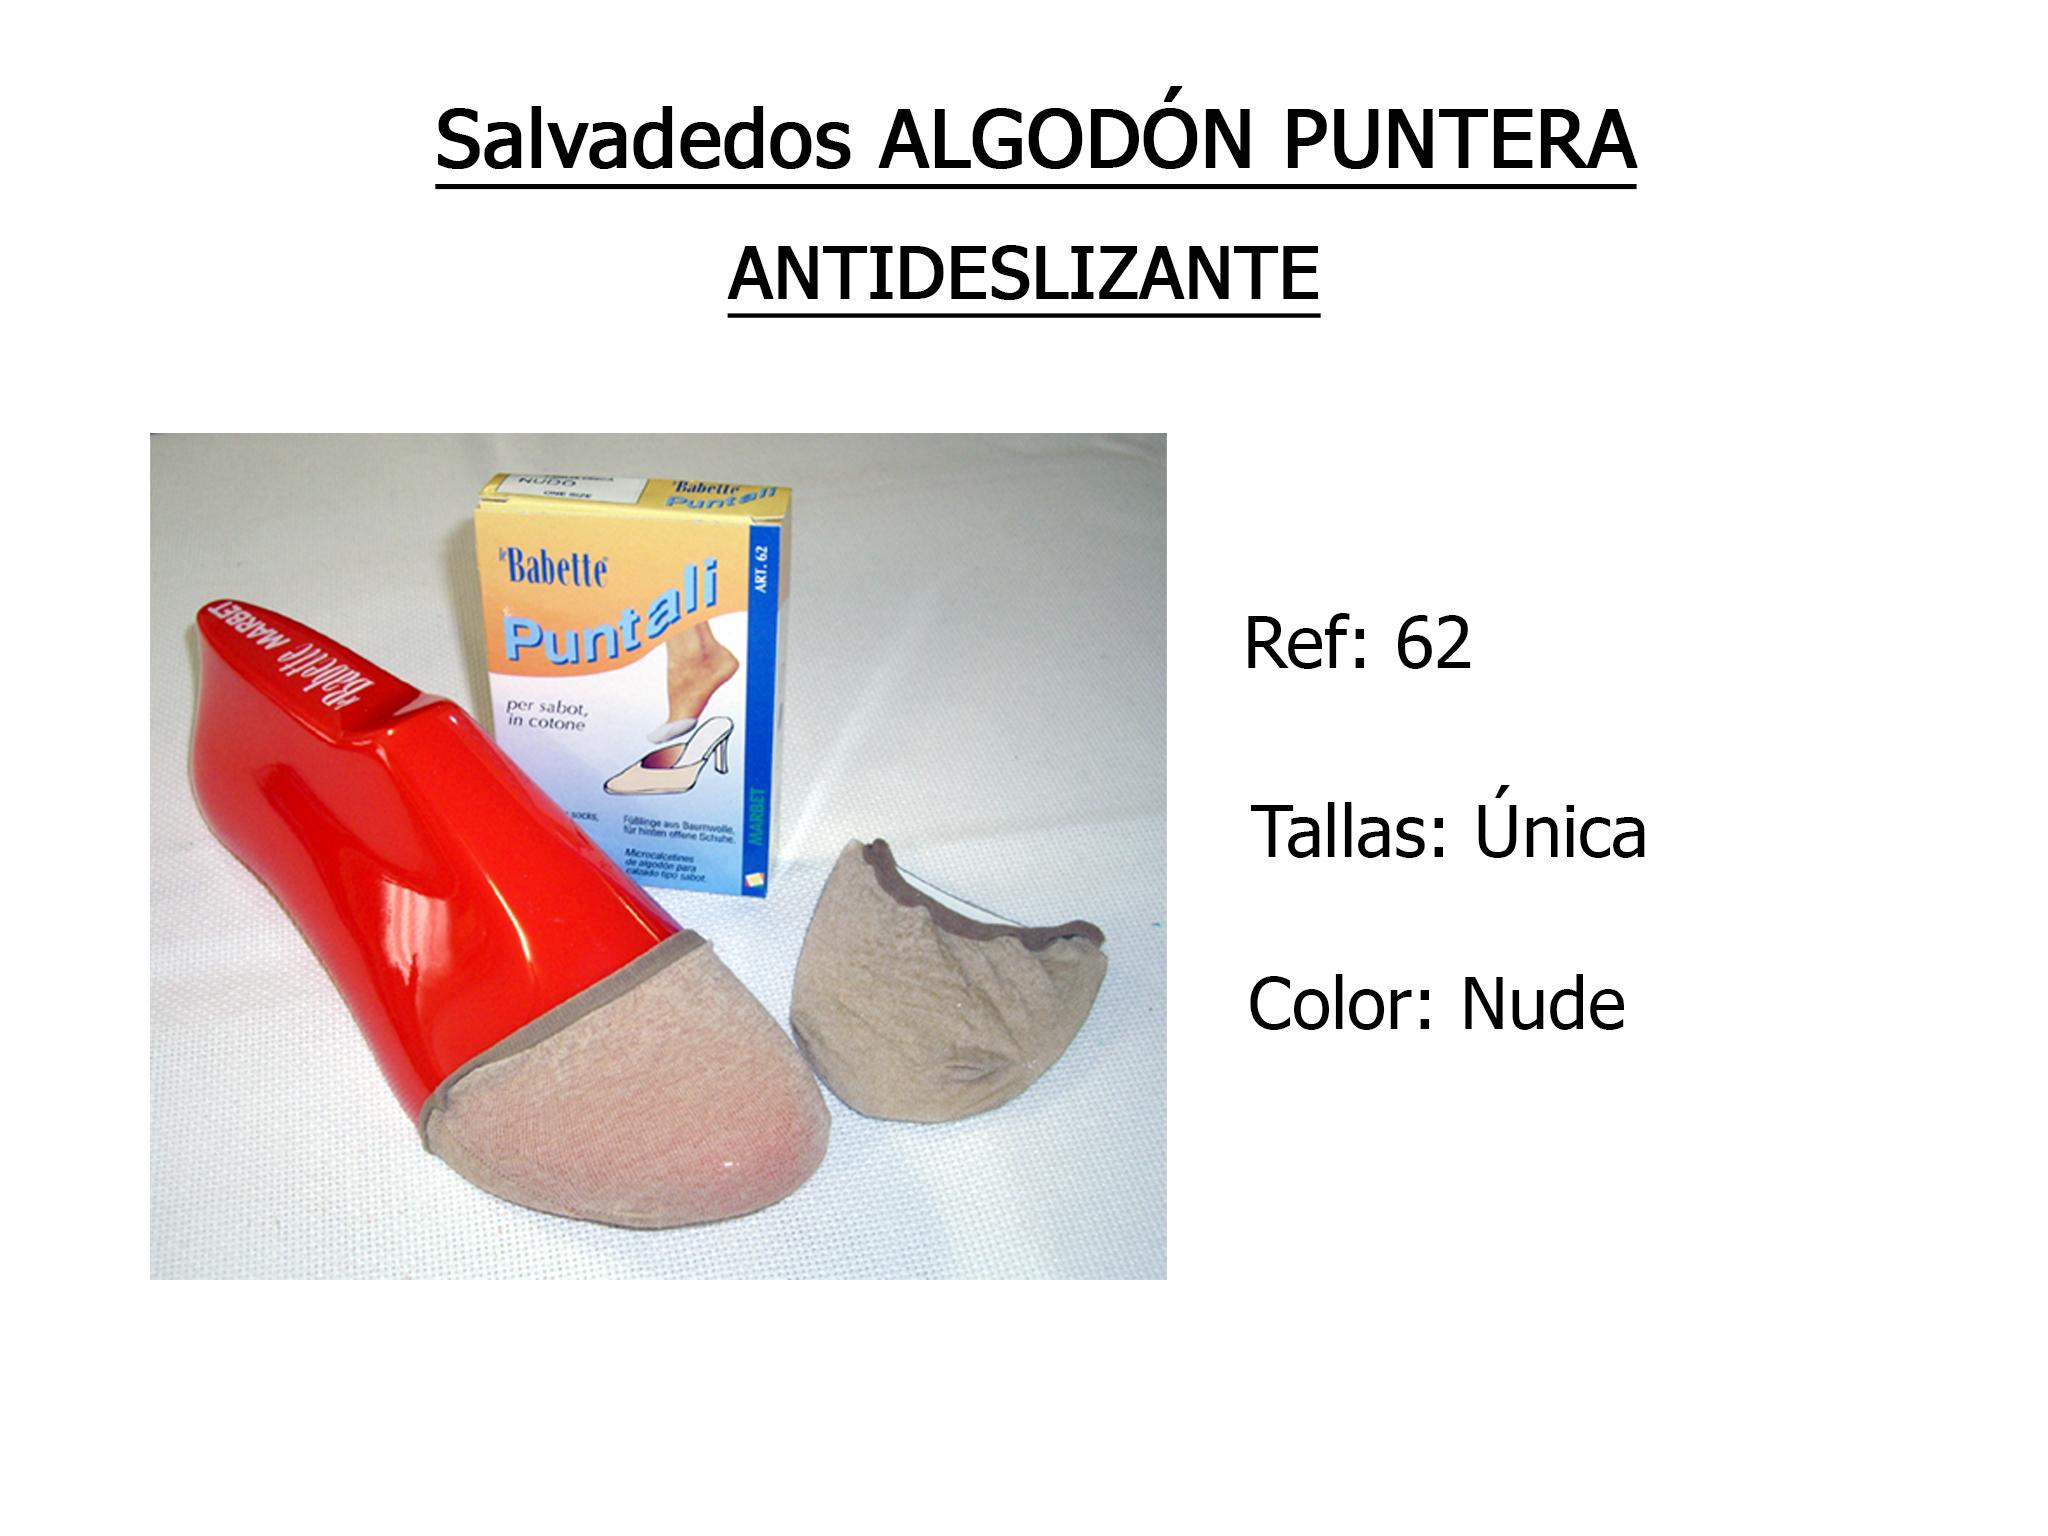 SALVADEDOS algodon puntera antideslizante 62